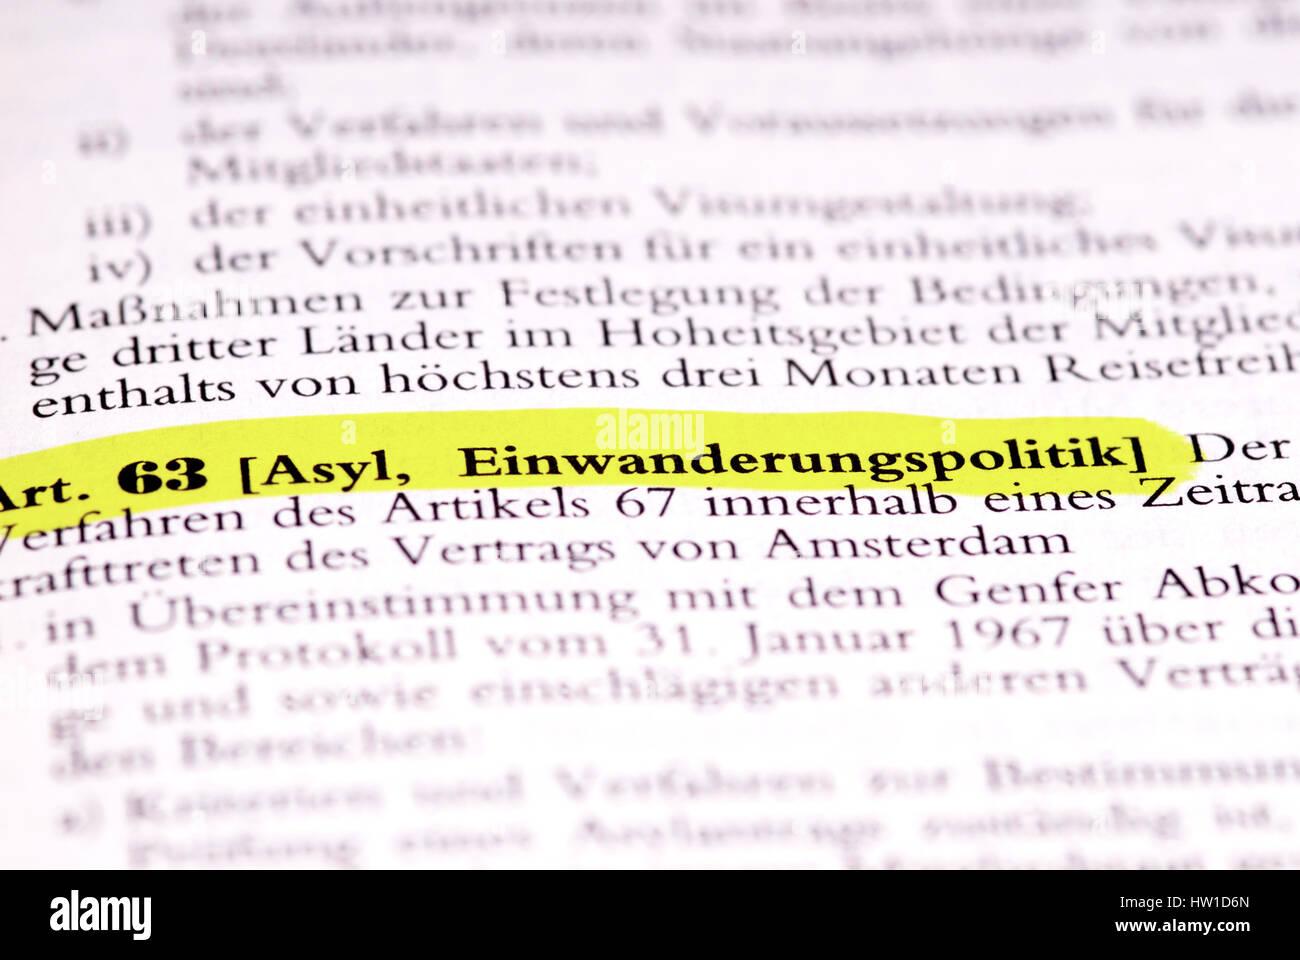 Legal text article. 63 asylums, immigration policy, Gesetzestext Art. 63 Asyl, Einwanderungspolitik - Stock Image